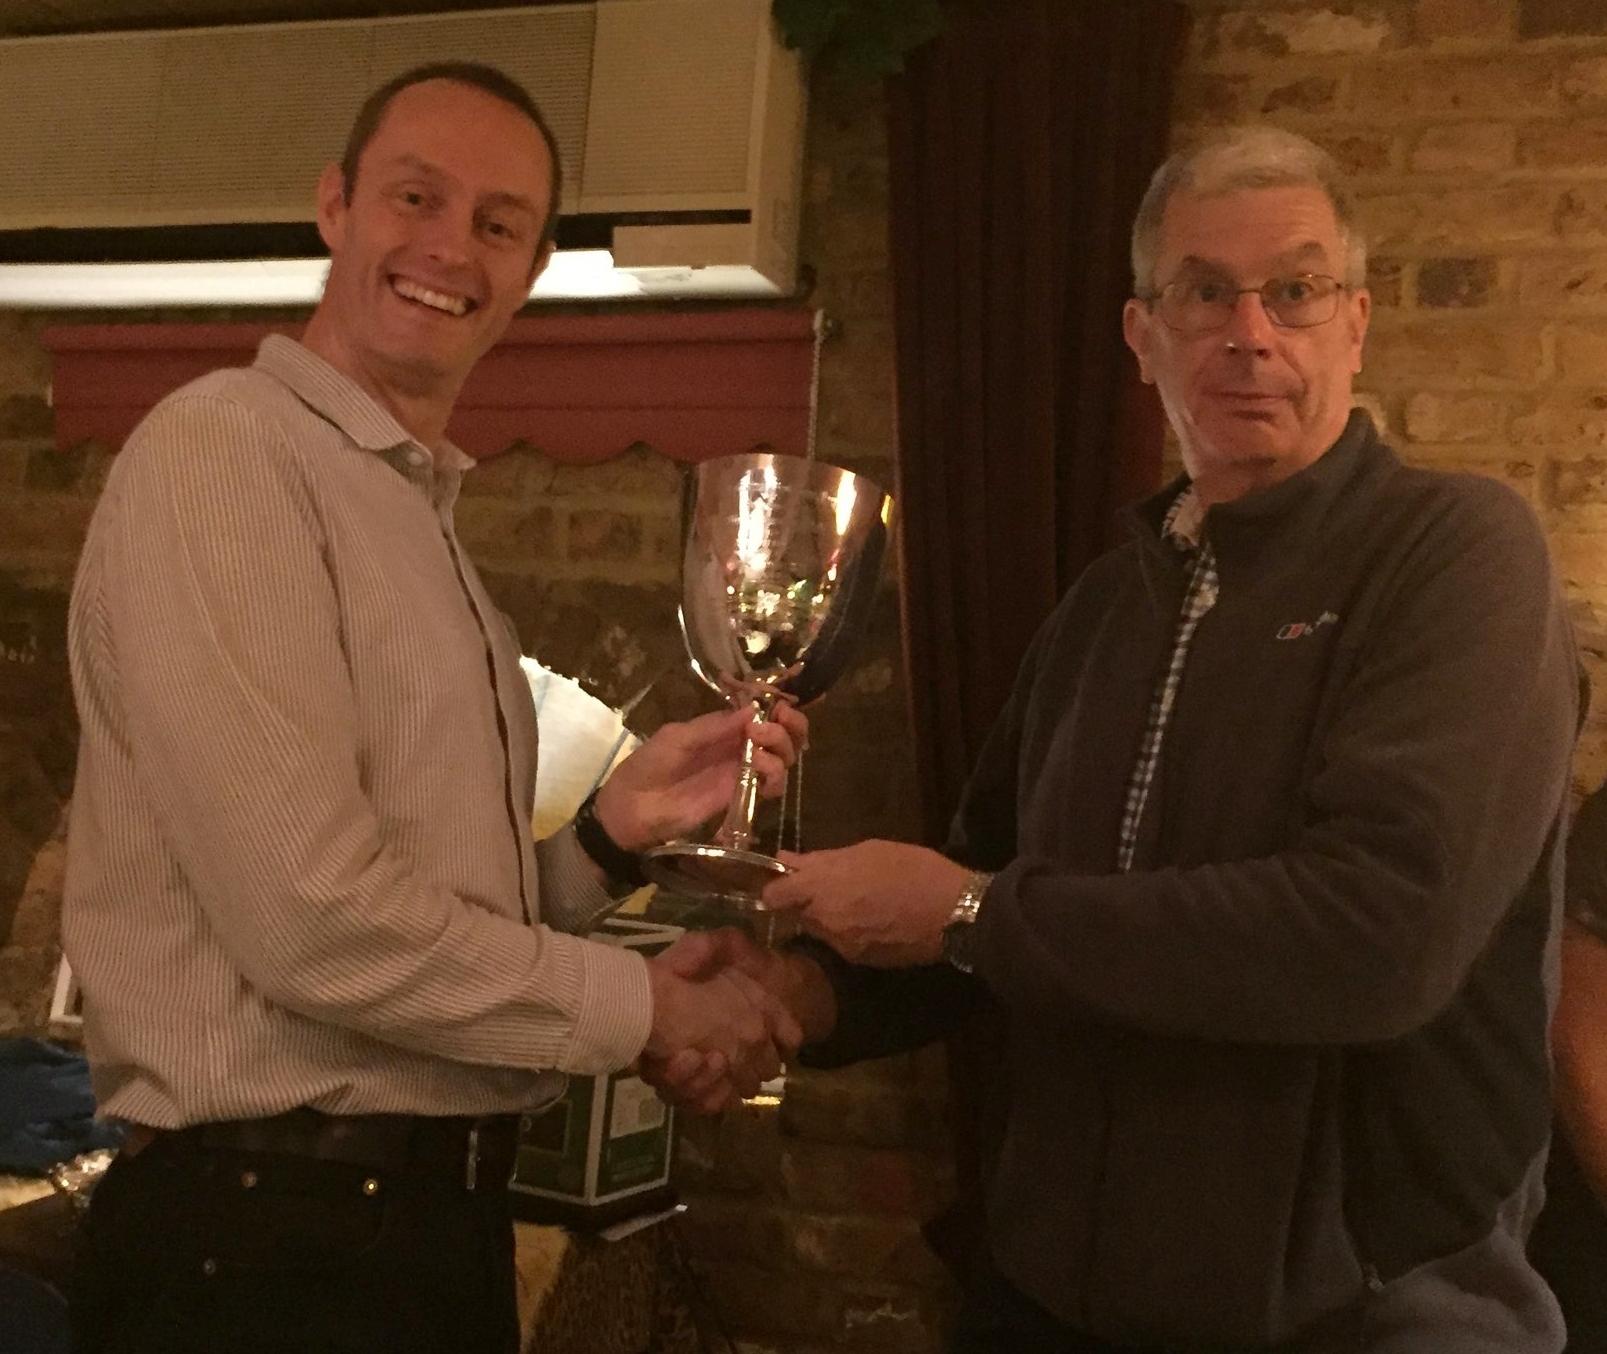 Men's mile winner Dave Warren receiving the trophy from President, Paul Hindle